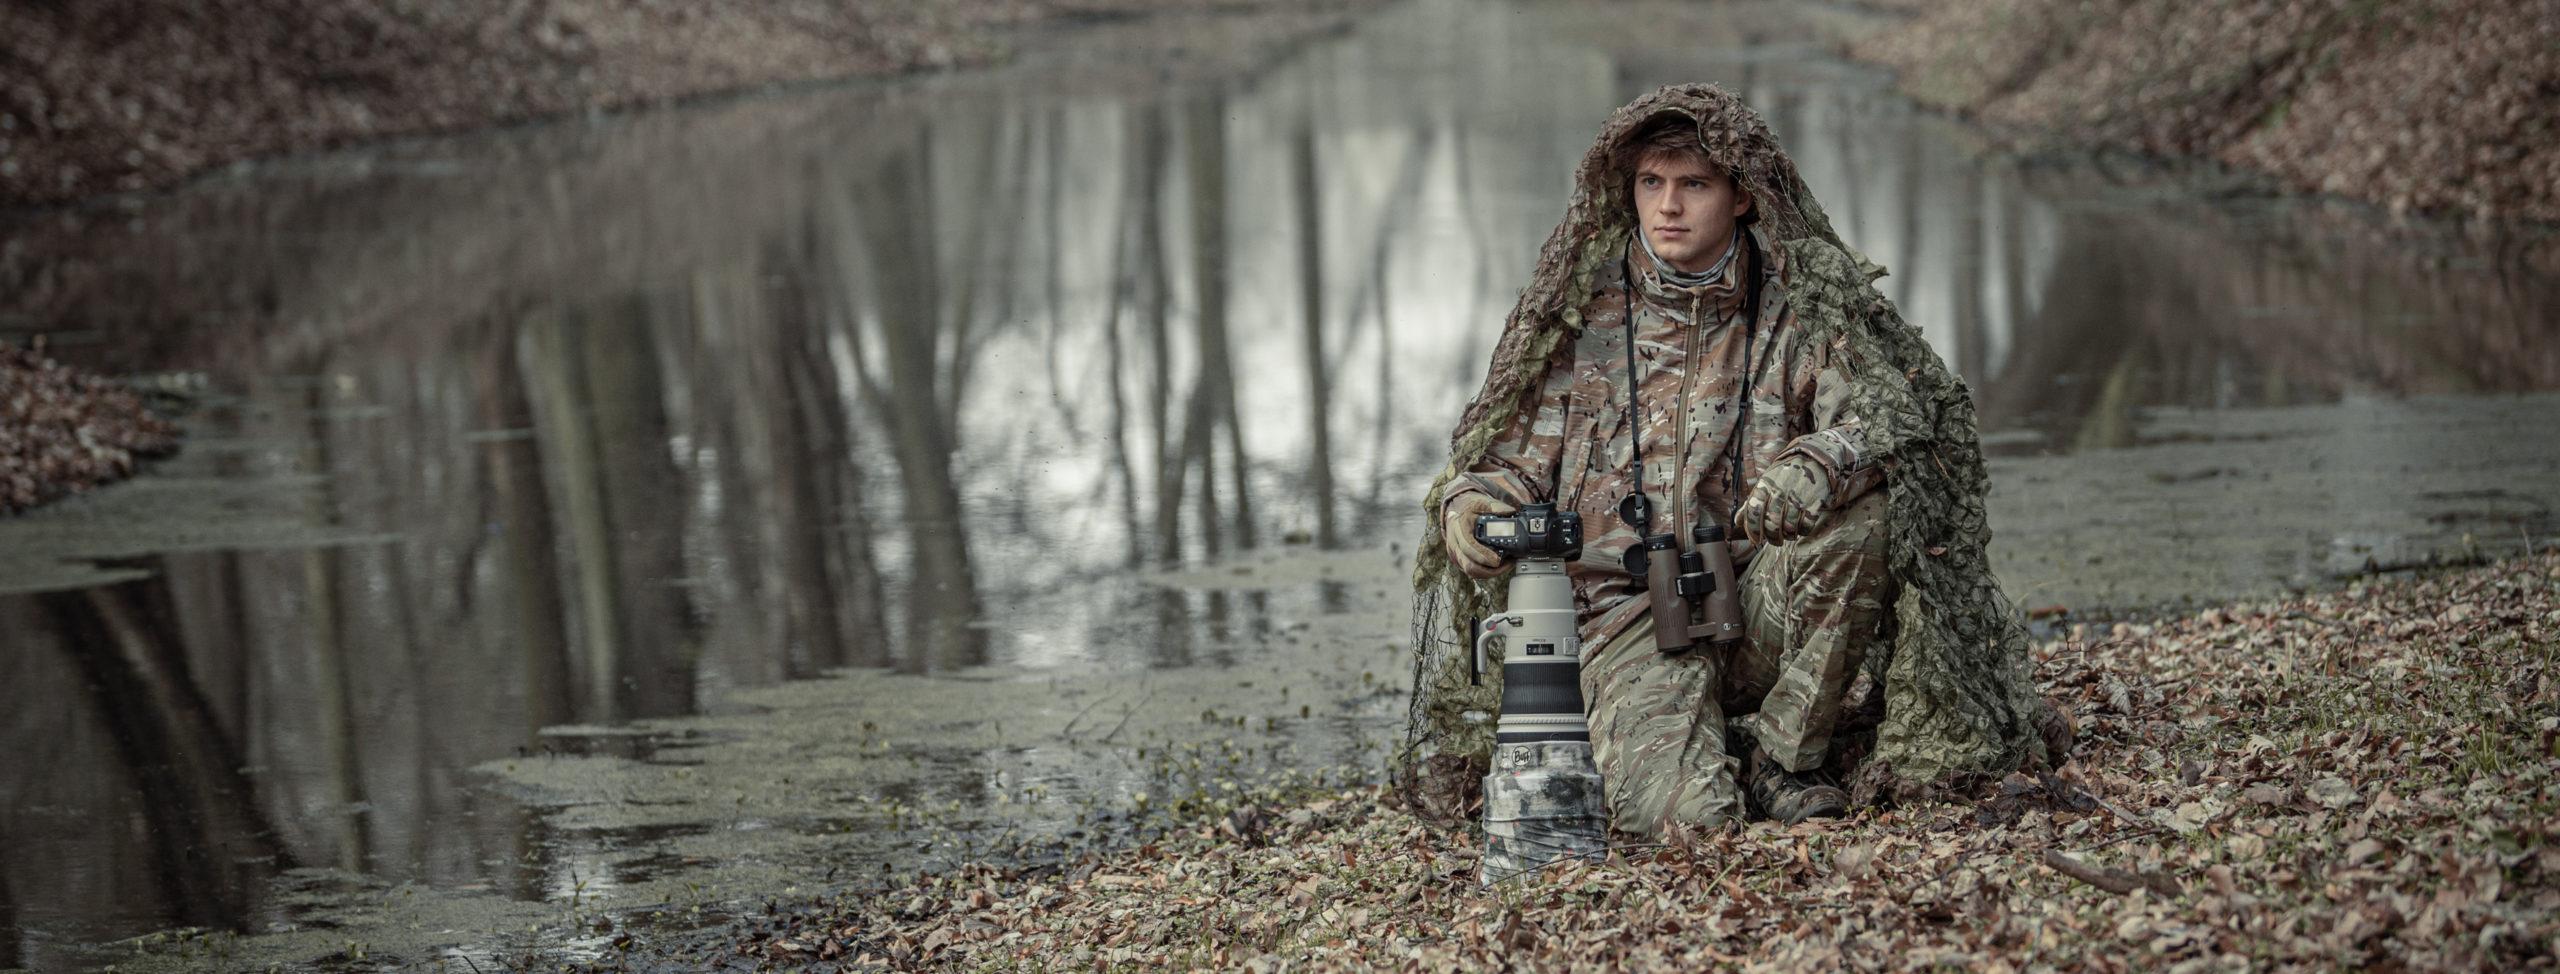 Ambasador Bushnell: Mateusz Piesiak, fotograf przyrody